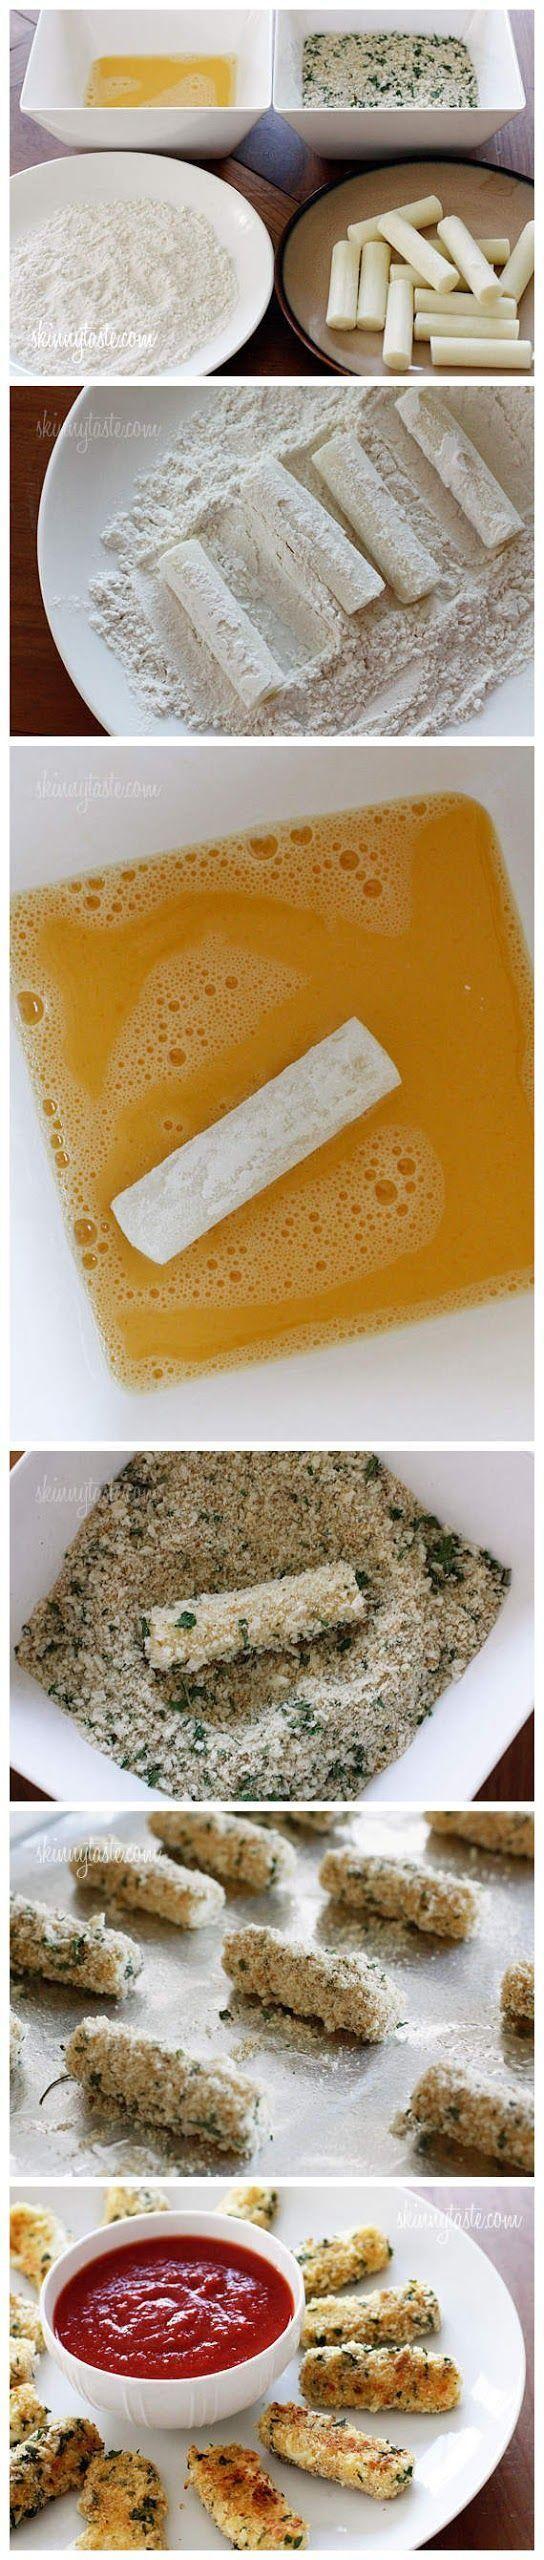 Skinny Baked Mozzarella Sticks - Love with recipe